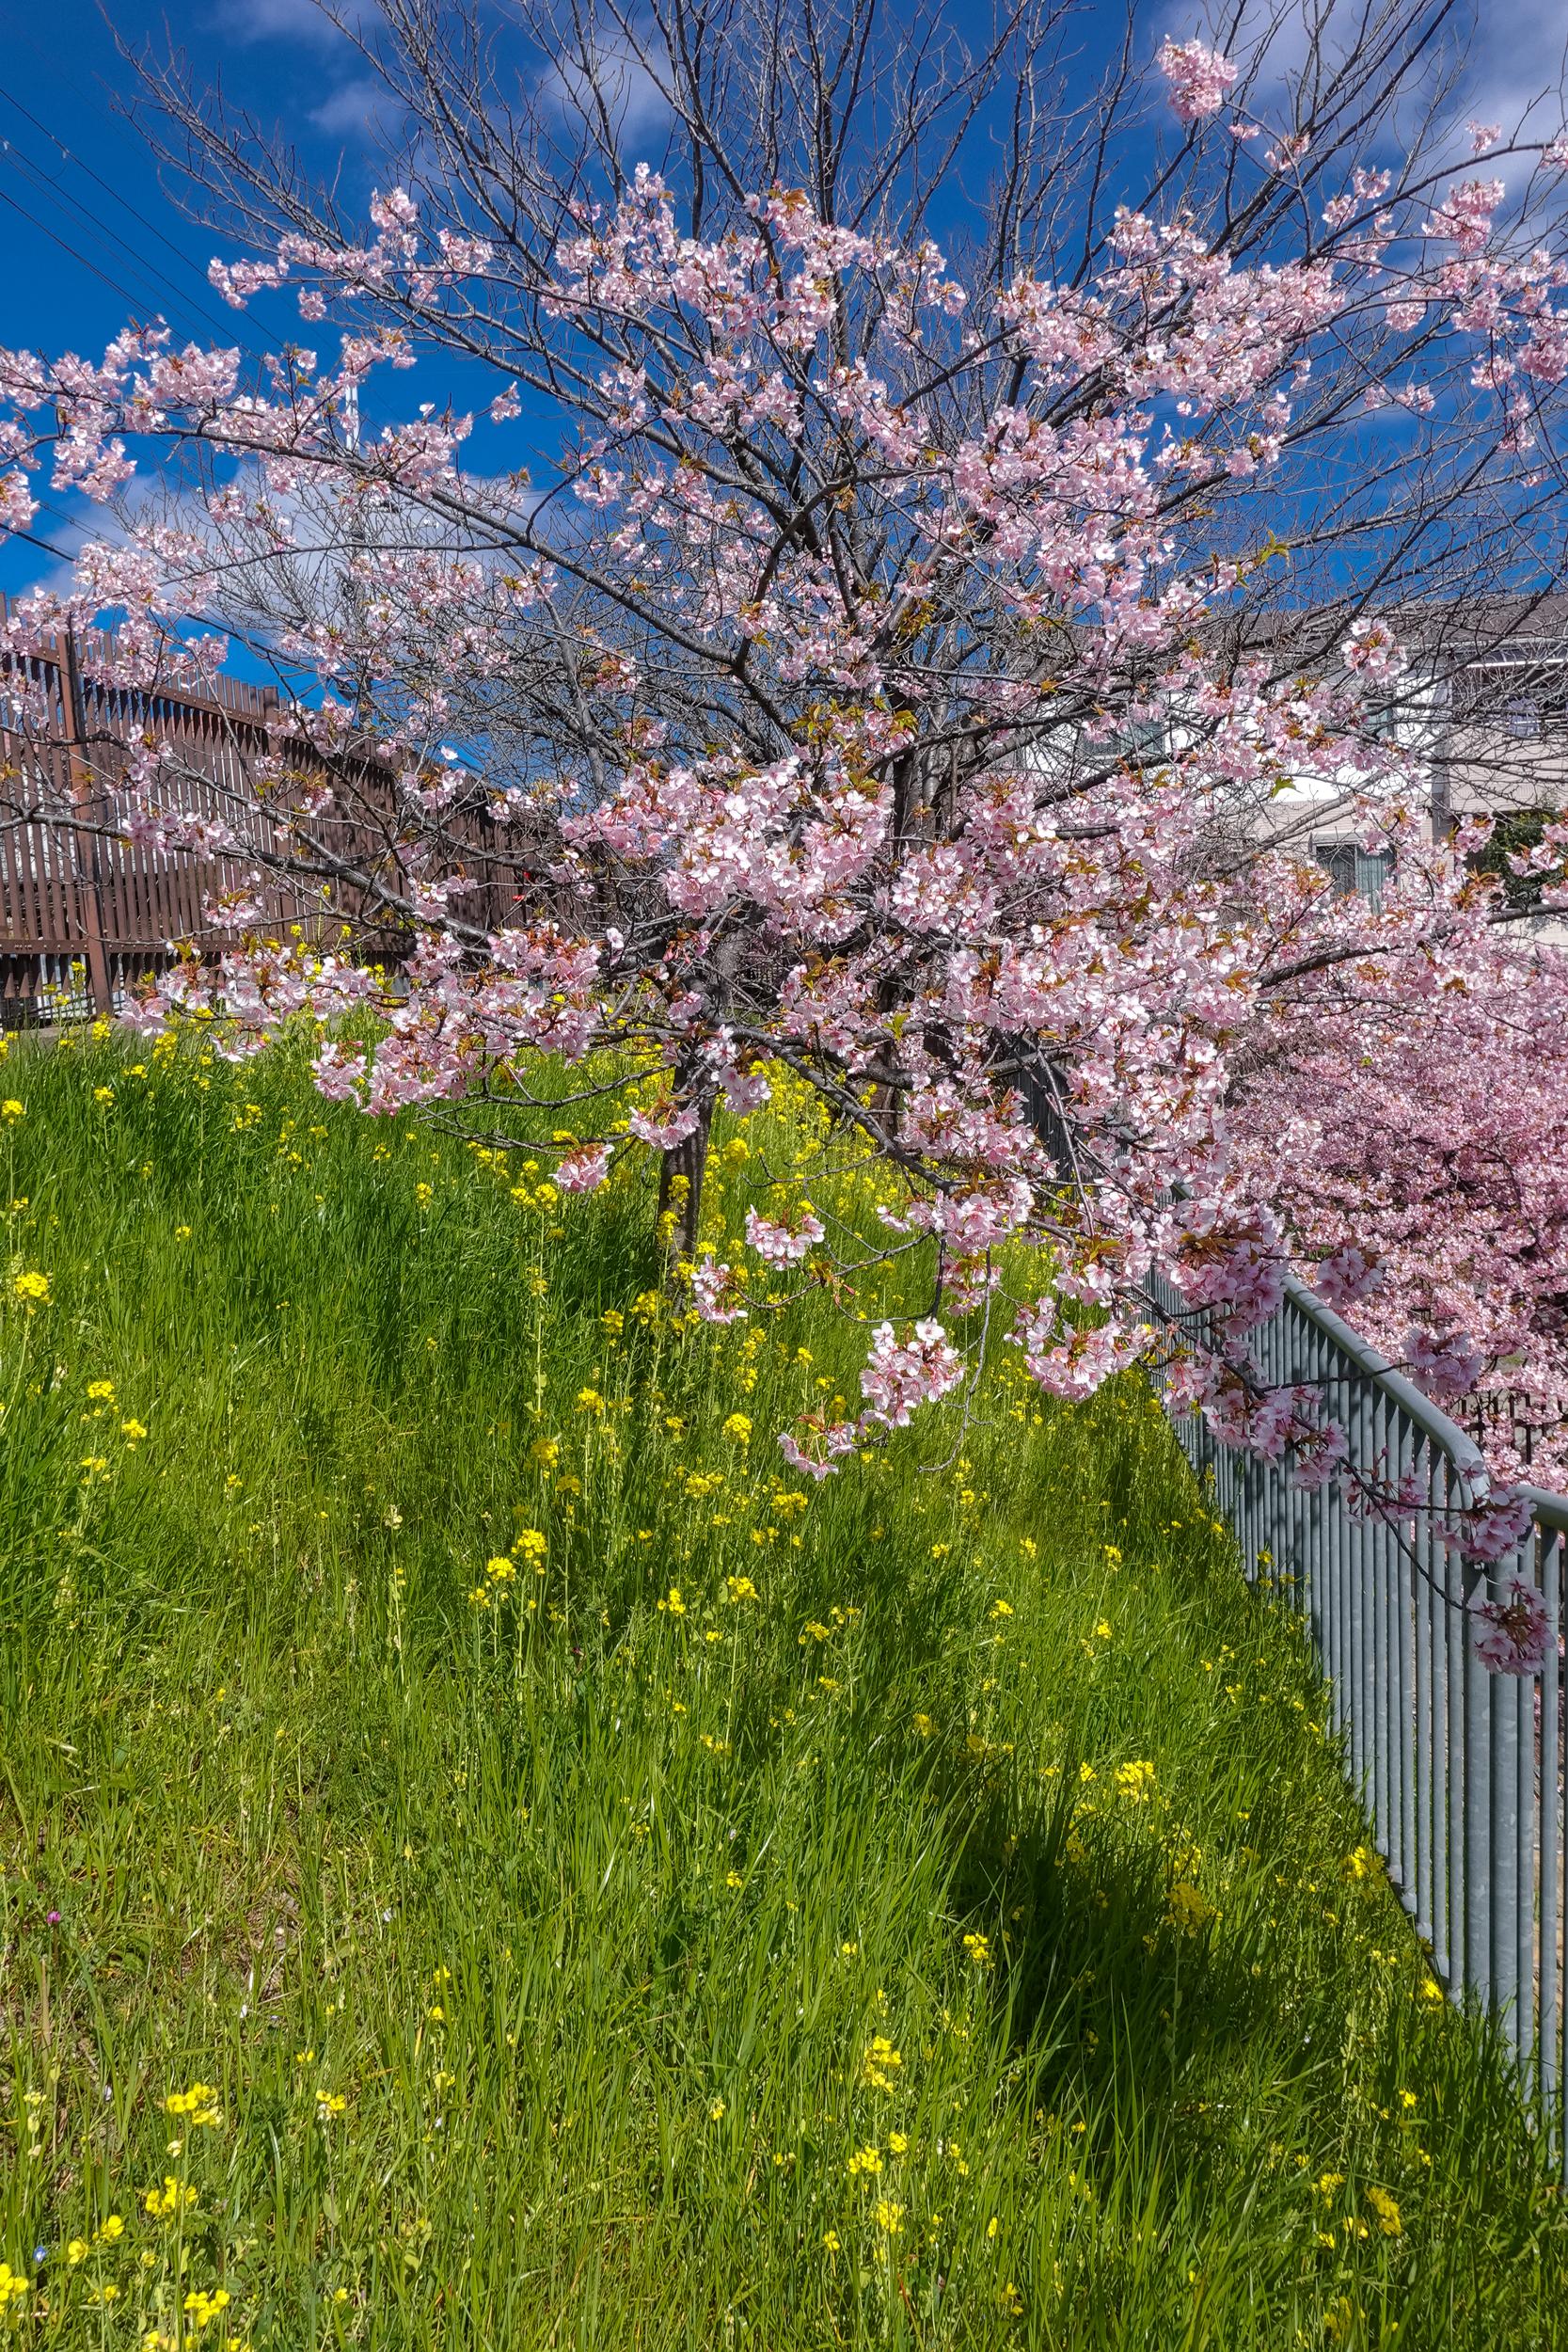 DSC03196 京都府 淀水路の河津桜(京都でいち早く桜が満開になるおすすめの河津桜写真スポット! アクセス方法や駐車場、2020年桜の開花状況など)